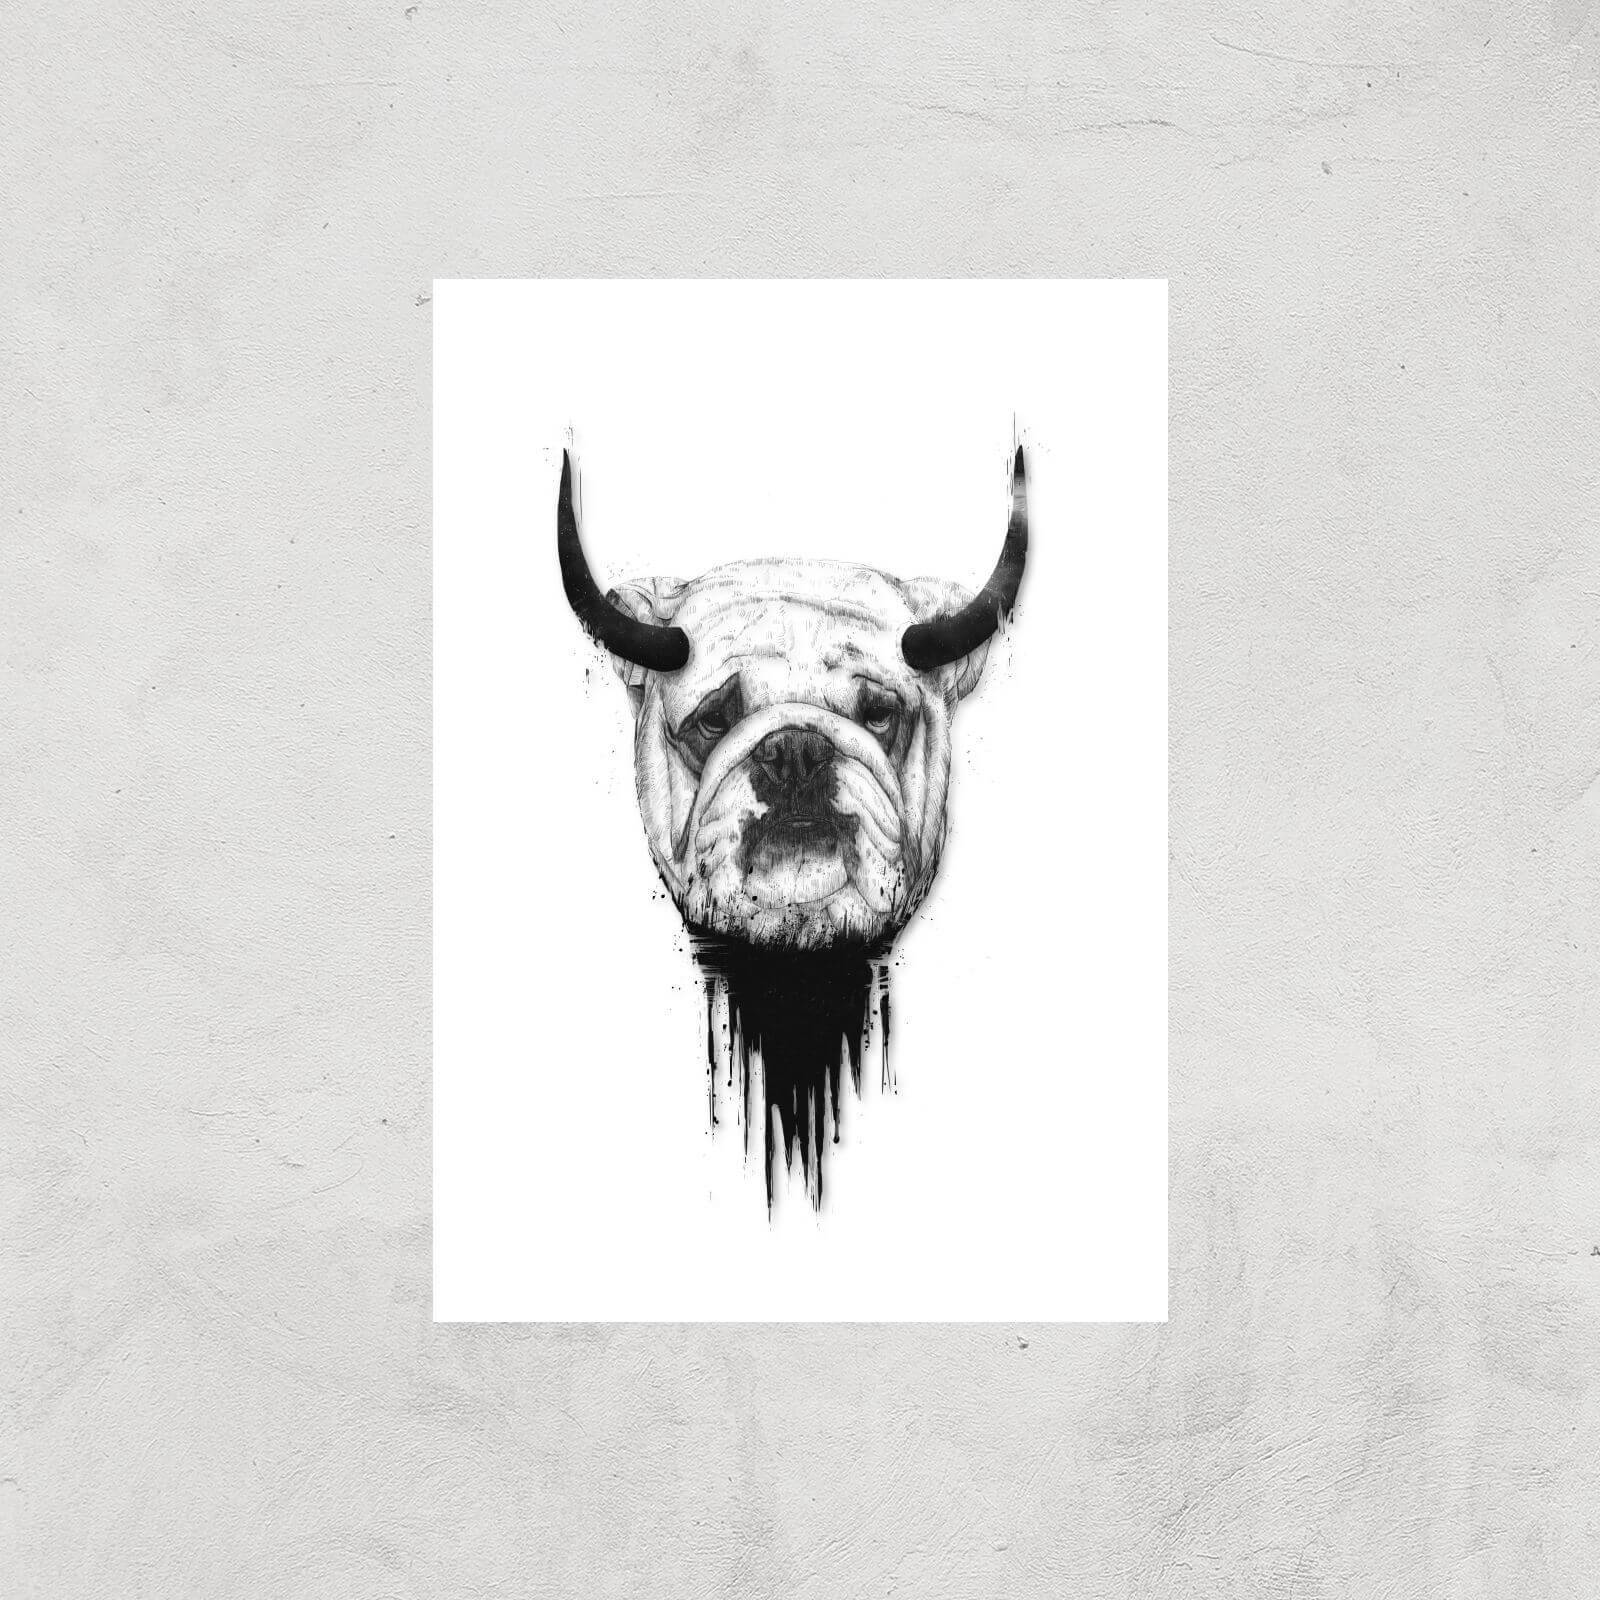 Balazs Solti English Bulldog Art Print - A4 - Print Only